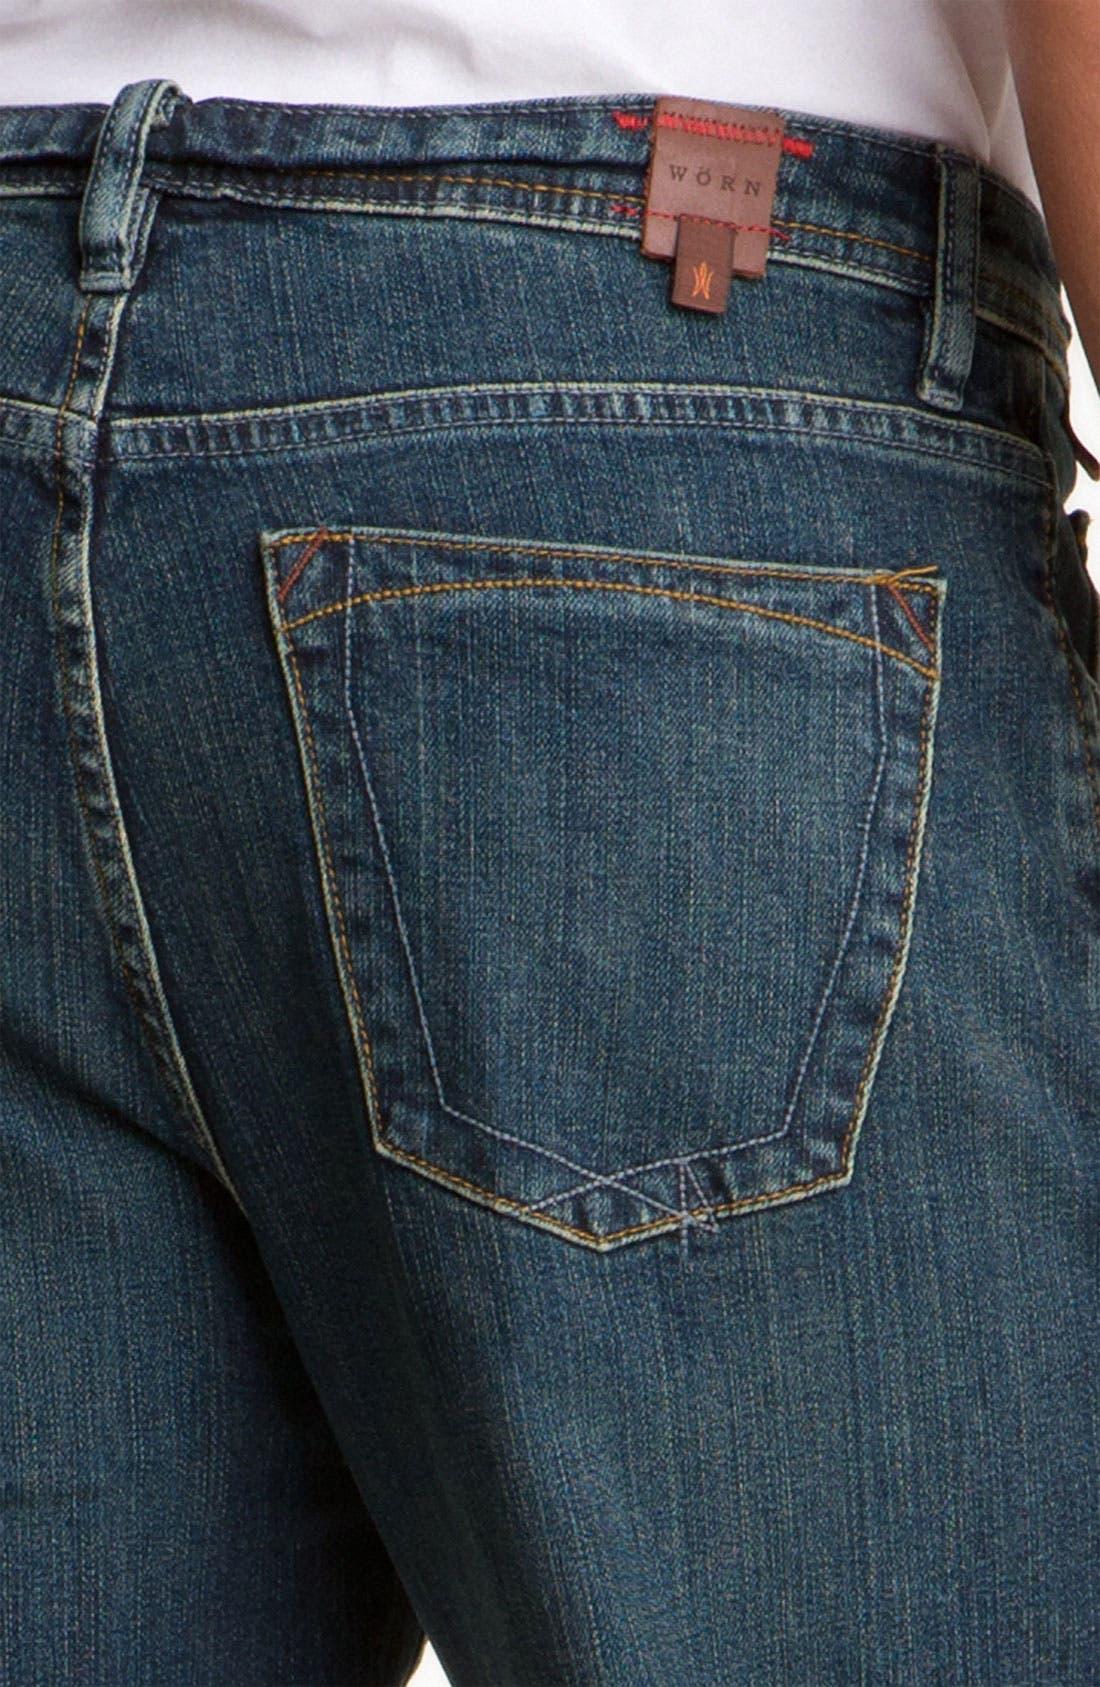 Alternate Image 3  - Worn Jeans 'Octane' Straight Leg Jeans (Dark Edge)